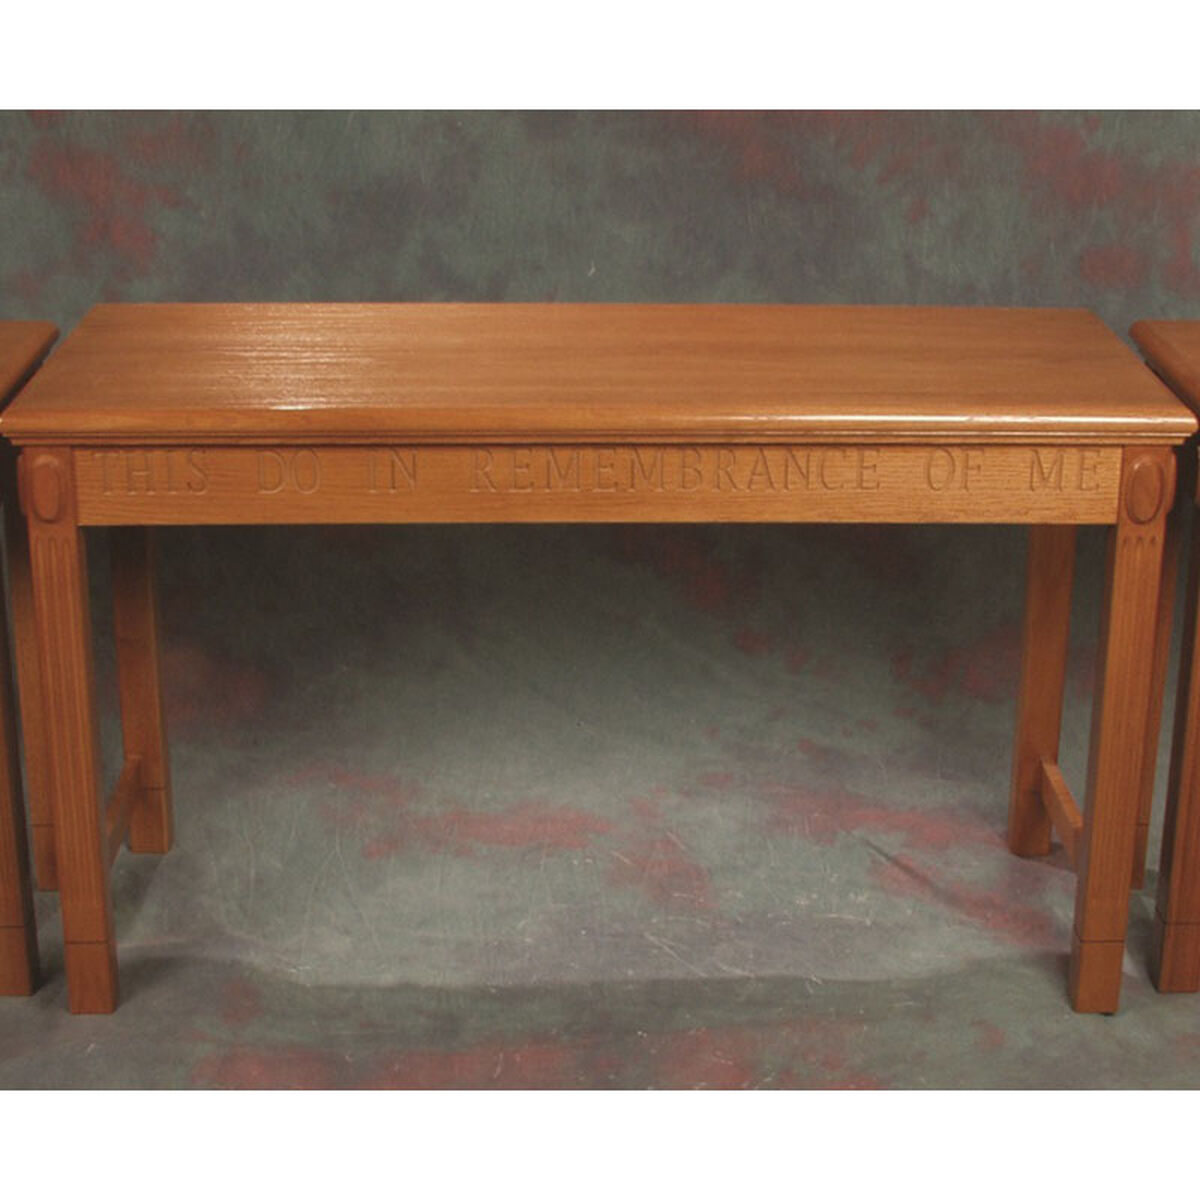 red oak open communion table tot 105 churchchairs4less com